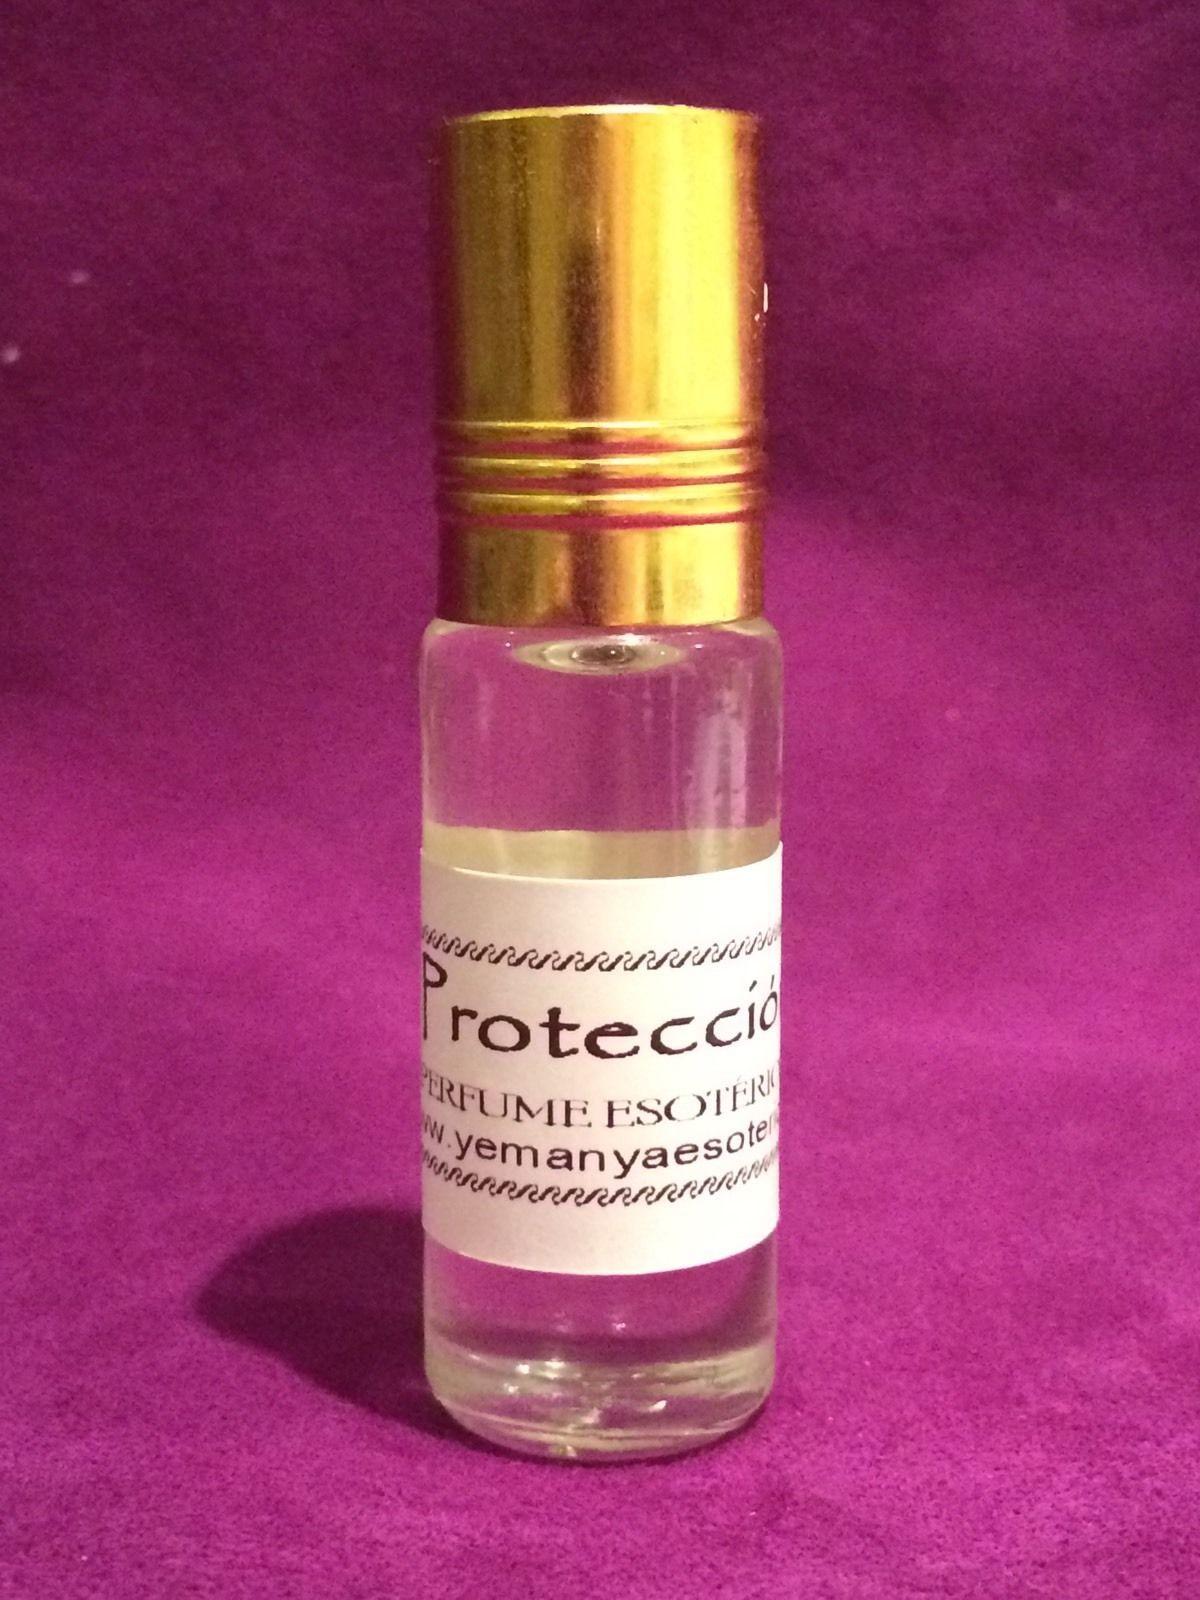 PERFUME ESOTERICO PROTECCION 5 ml